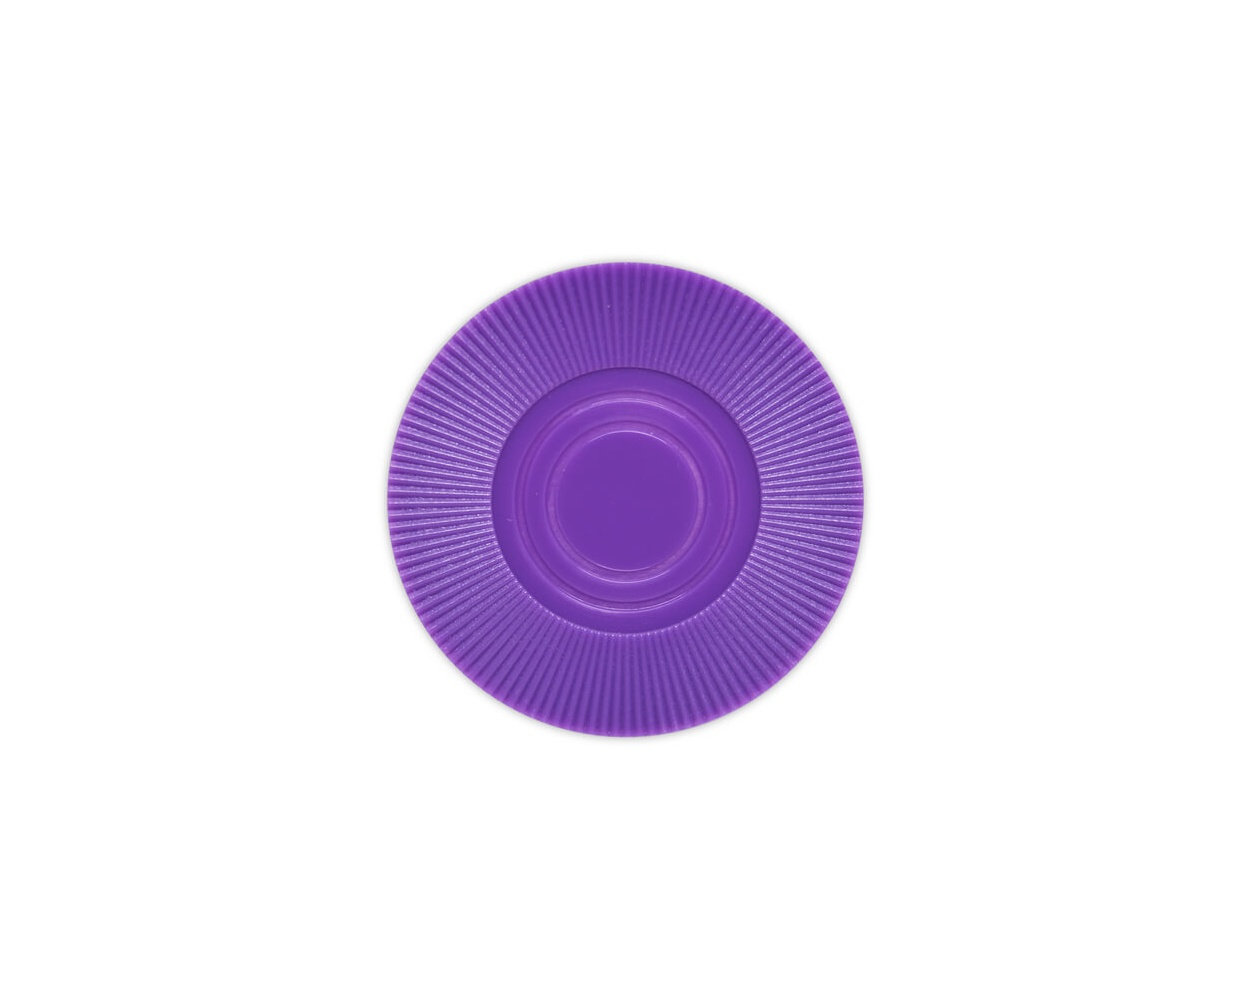 Radial Interlocking - Purple Plastic Poker Chips